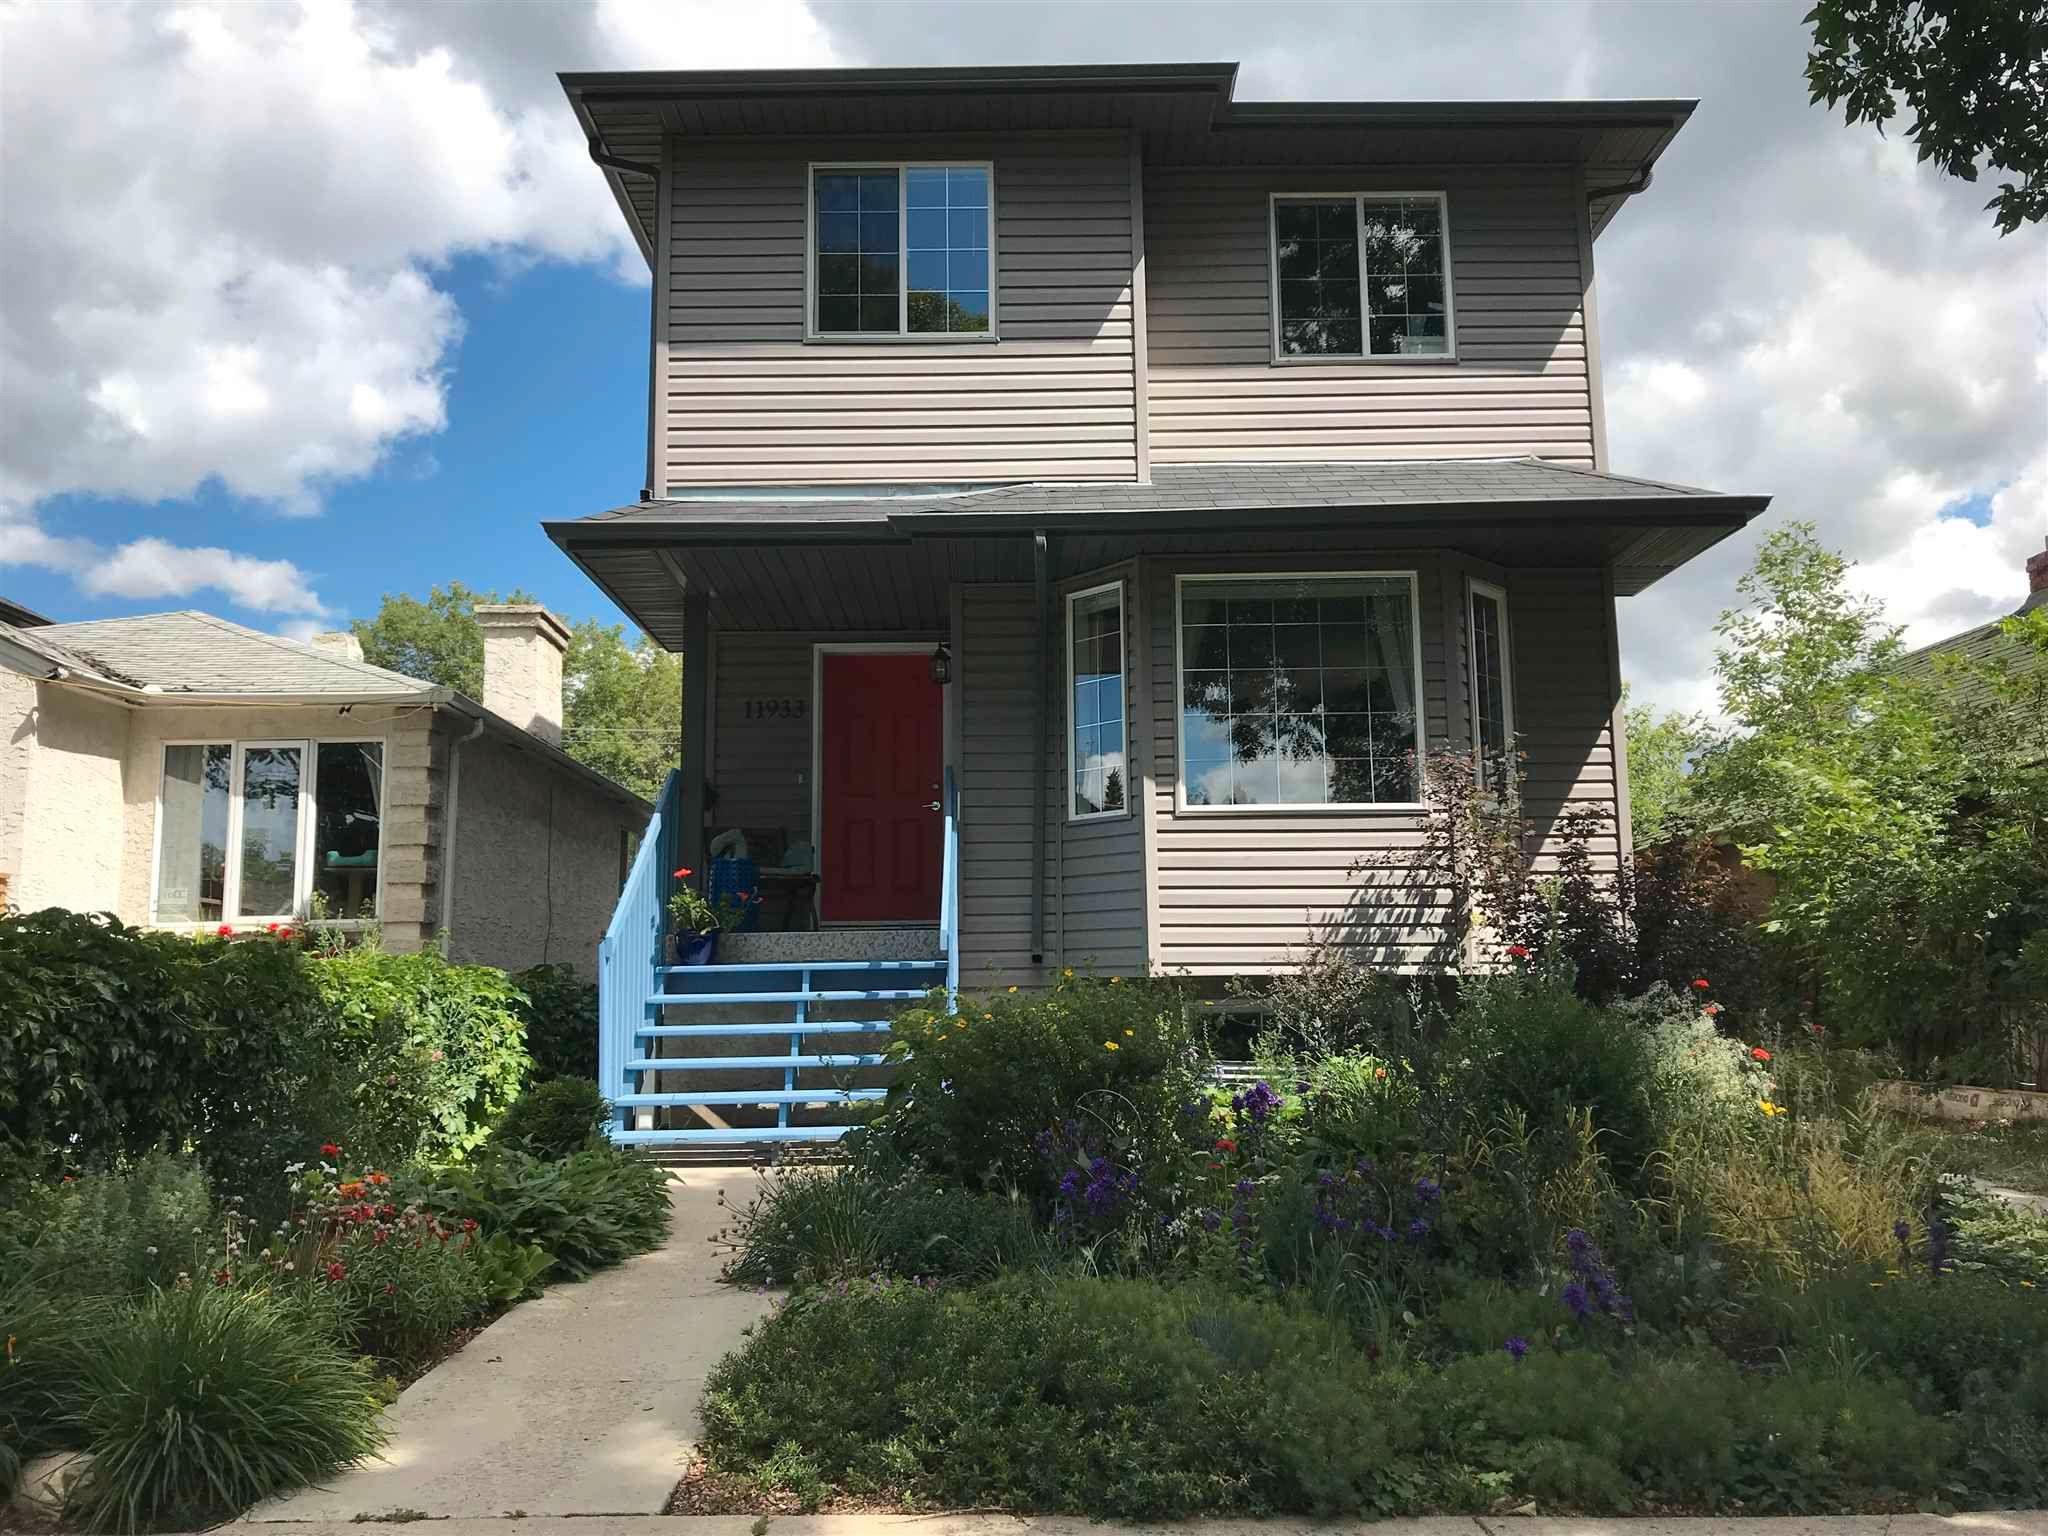 Main Photo: 11933 77 Street in Edmonton: Zone 05 House Half Duplex for sale : MLS®# E4246316